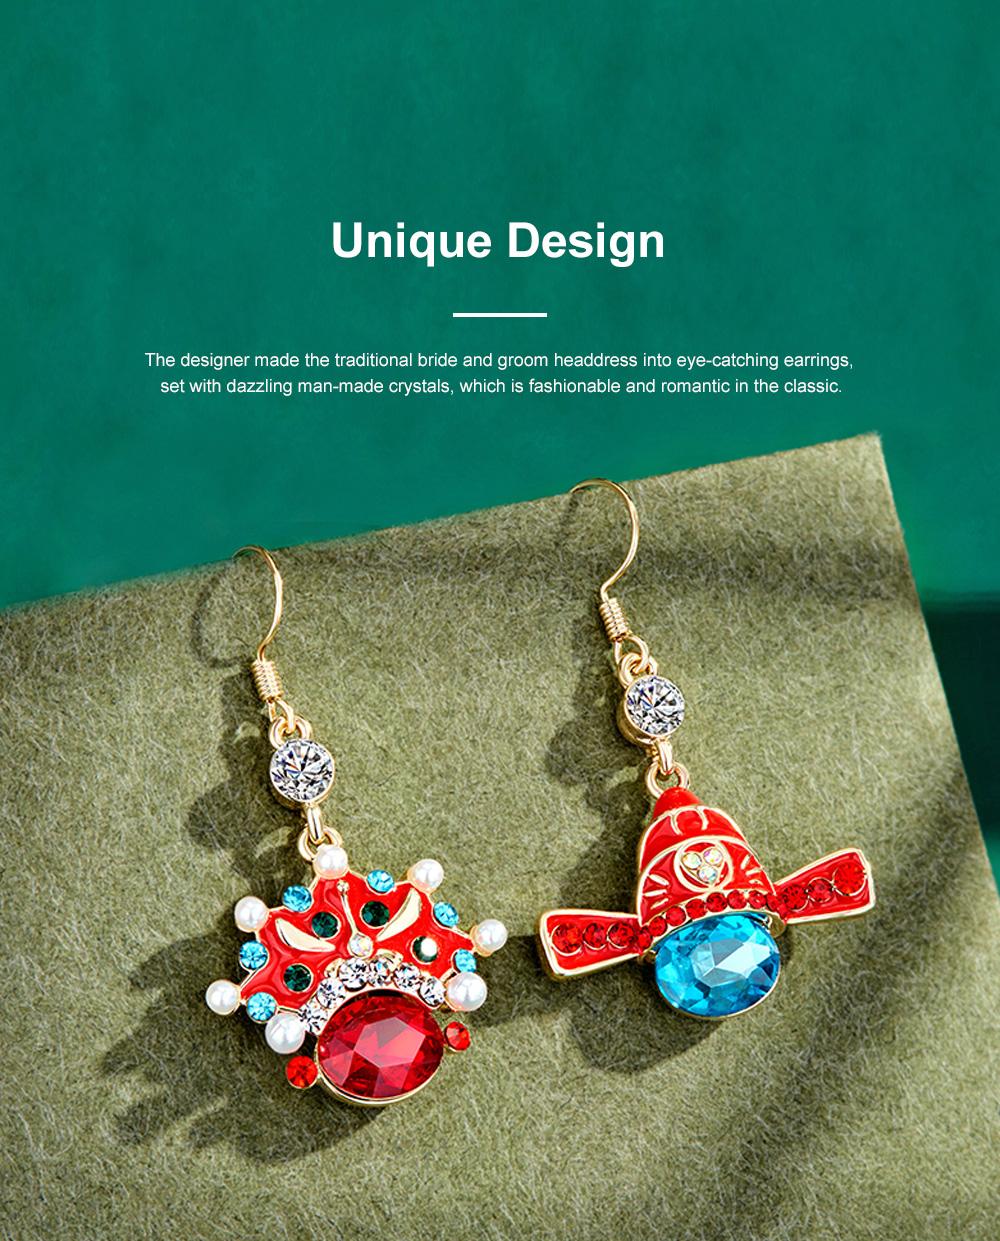 Chinese Style Dangle Earrings Asymmetric Personality Crystal Earrings Bride Groom Earrings Studs 4